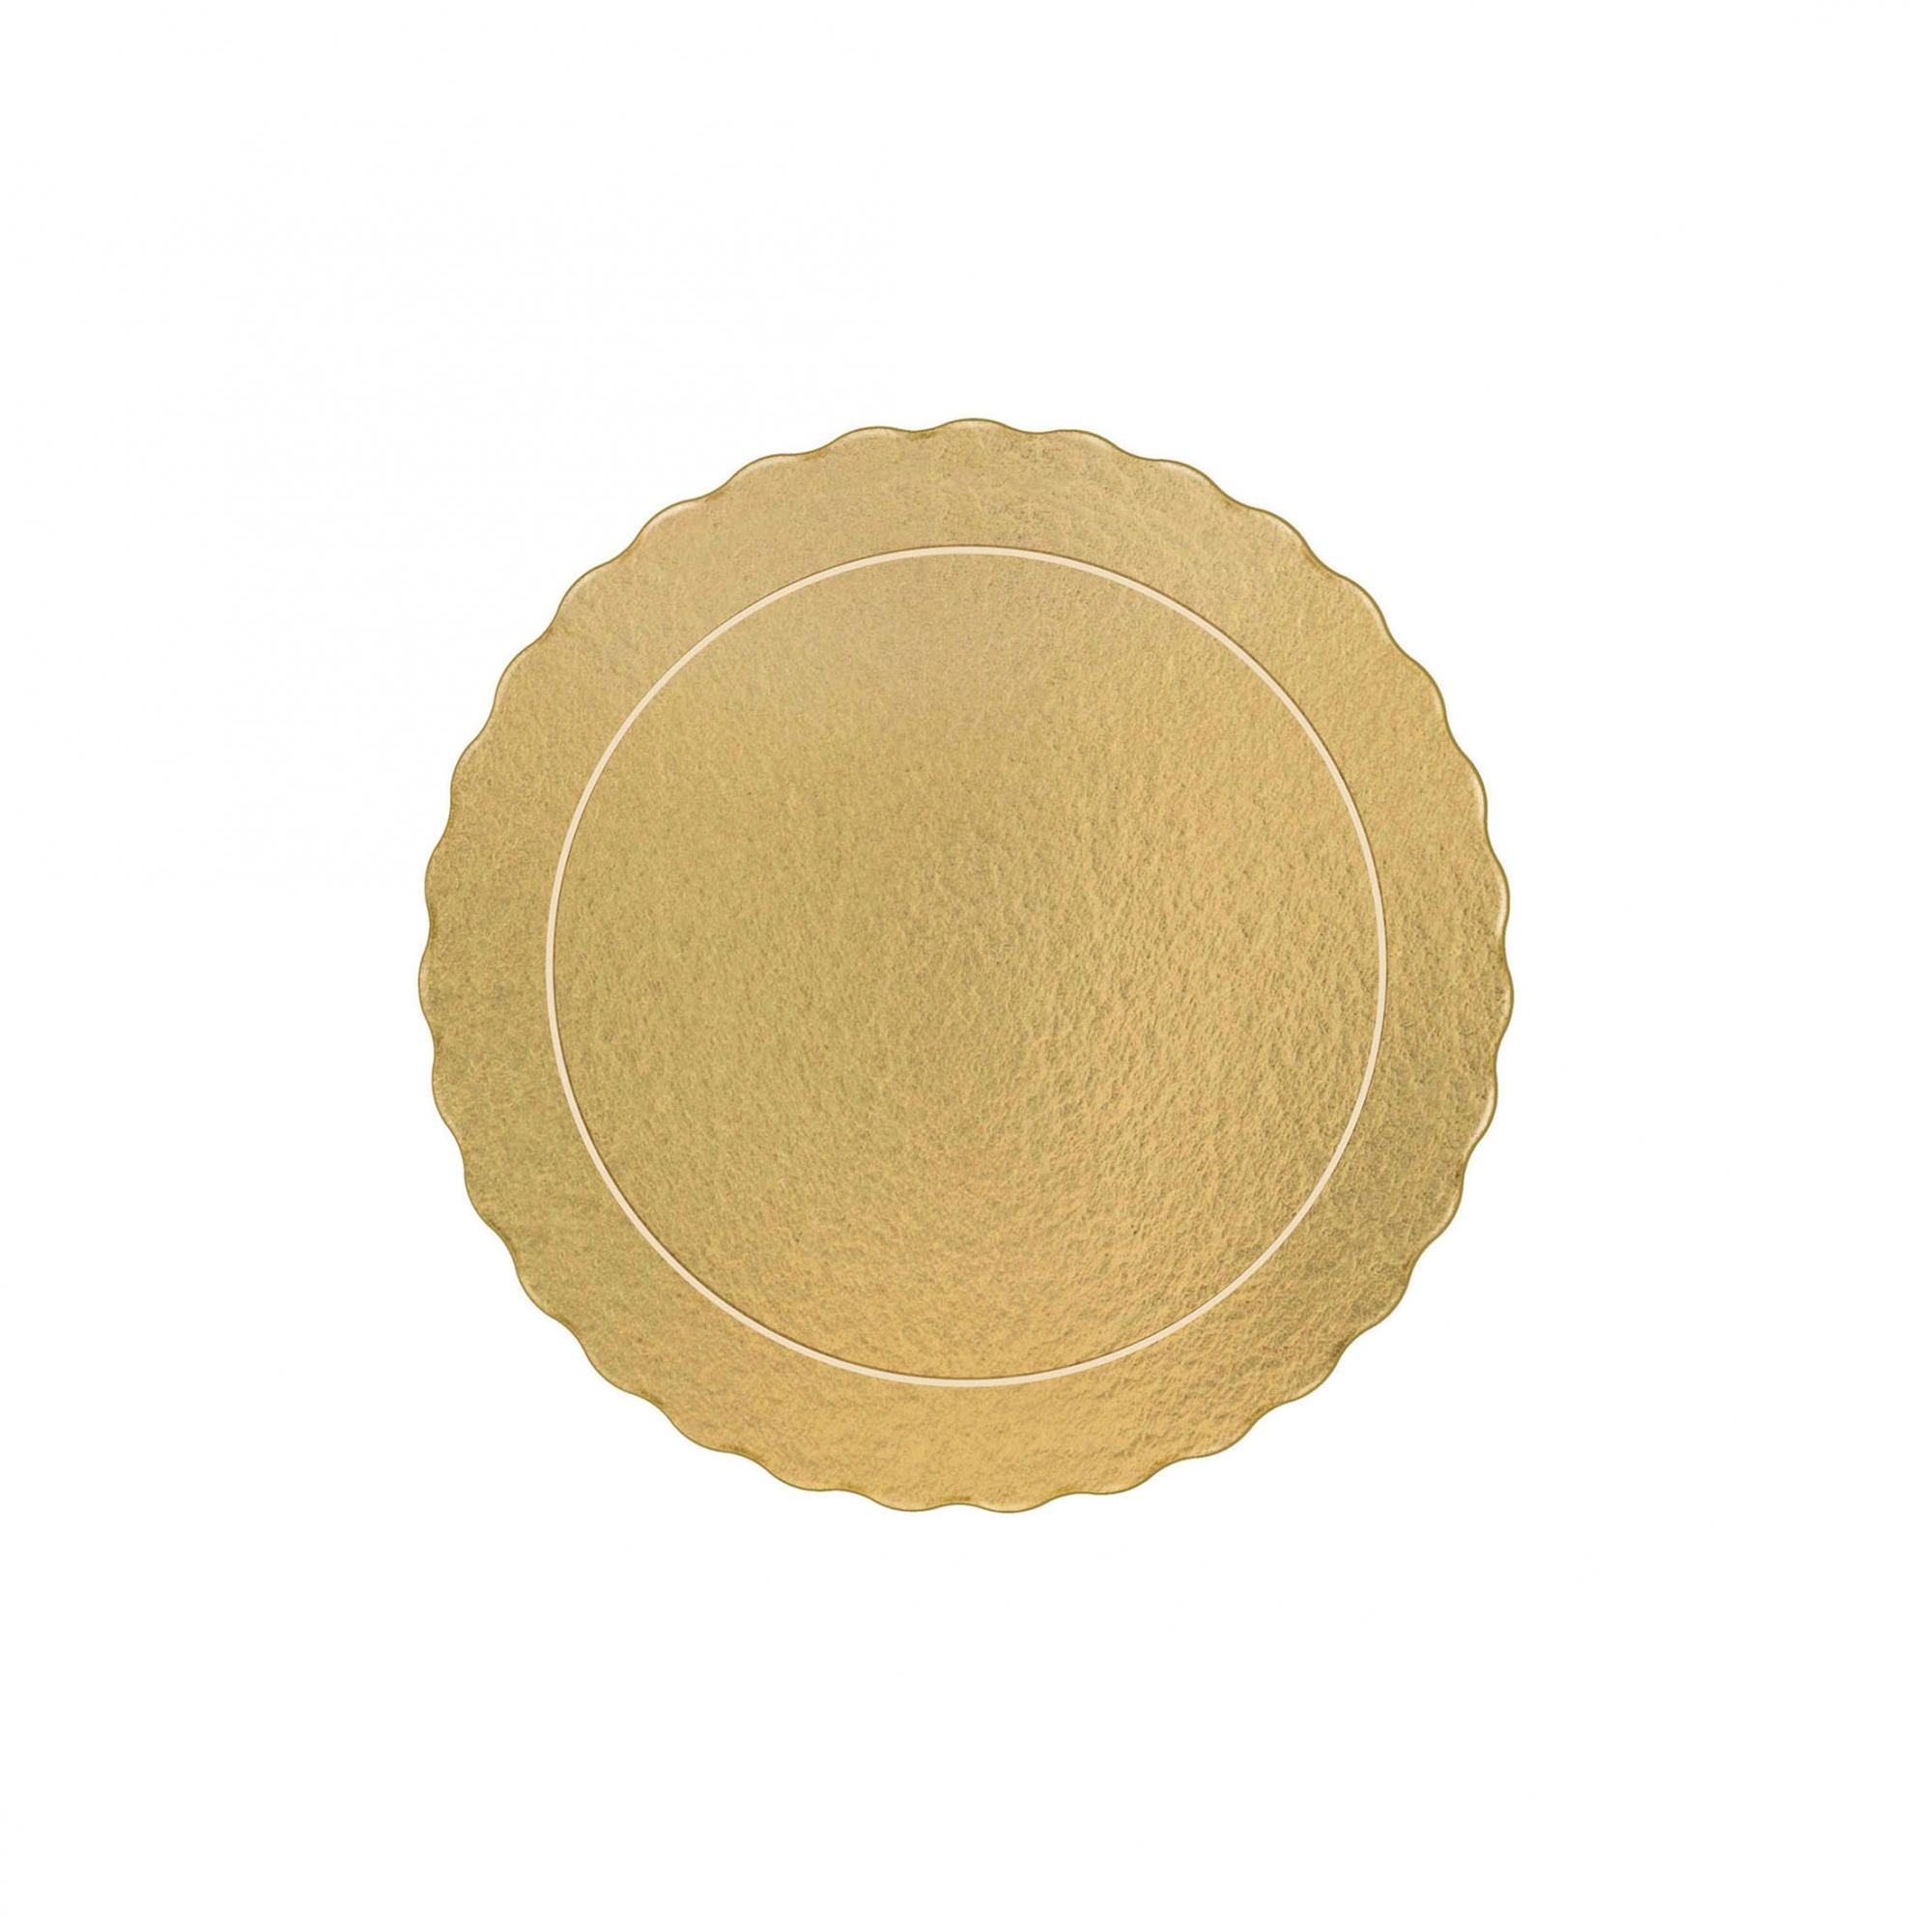 100 Bases Laminadas, Suporte P/ Bolo, Cake Board, 17cm - Ouro